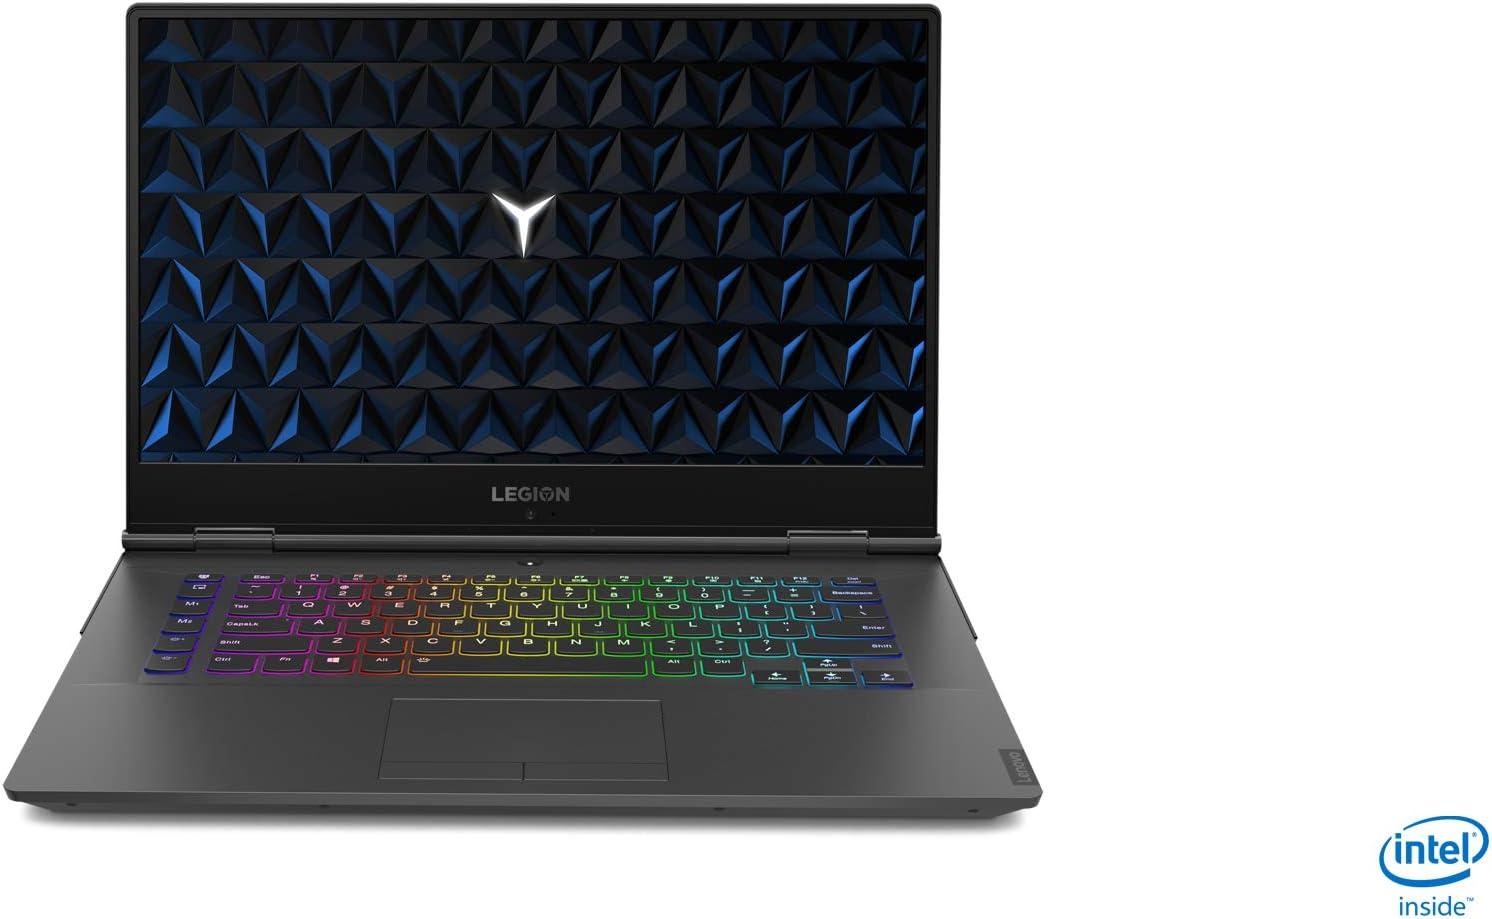 "Lenovo Legion Y740-15IRH Gaming Laptop, 15.6"" Screen, Intel Core i7, 16GB Memory, 1TB Hard Drive/256GB Solid State Drive, Windows 10, 81UF0001US"